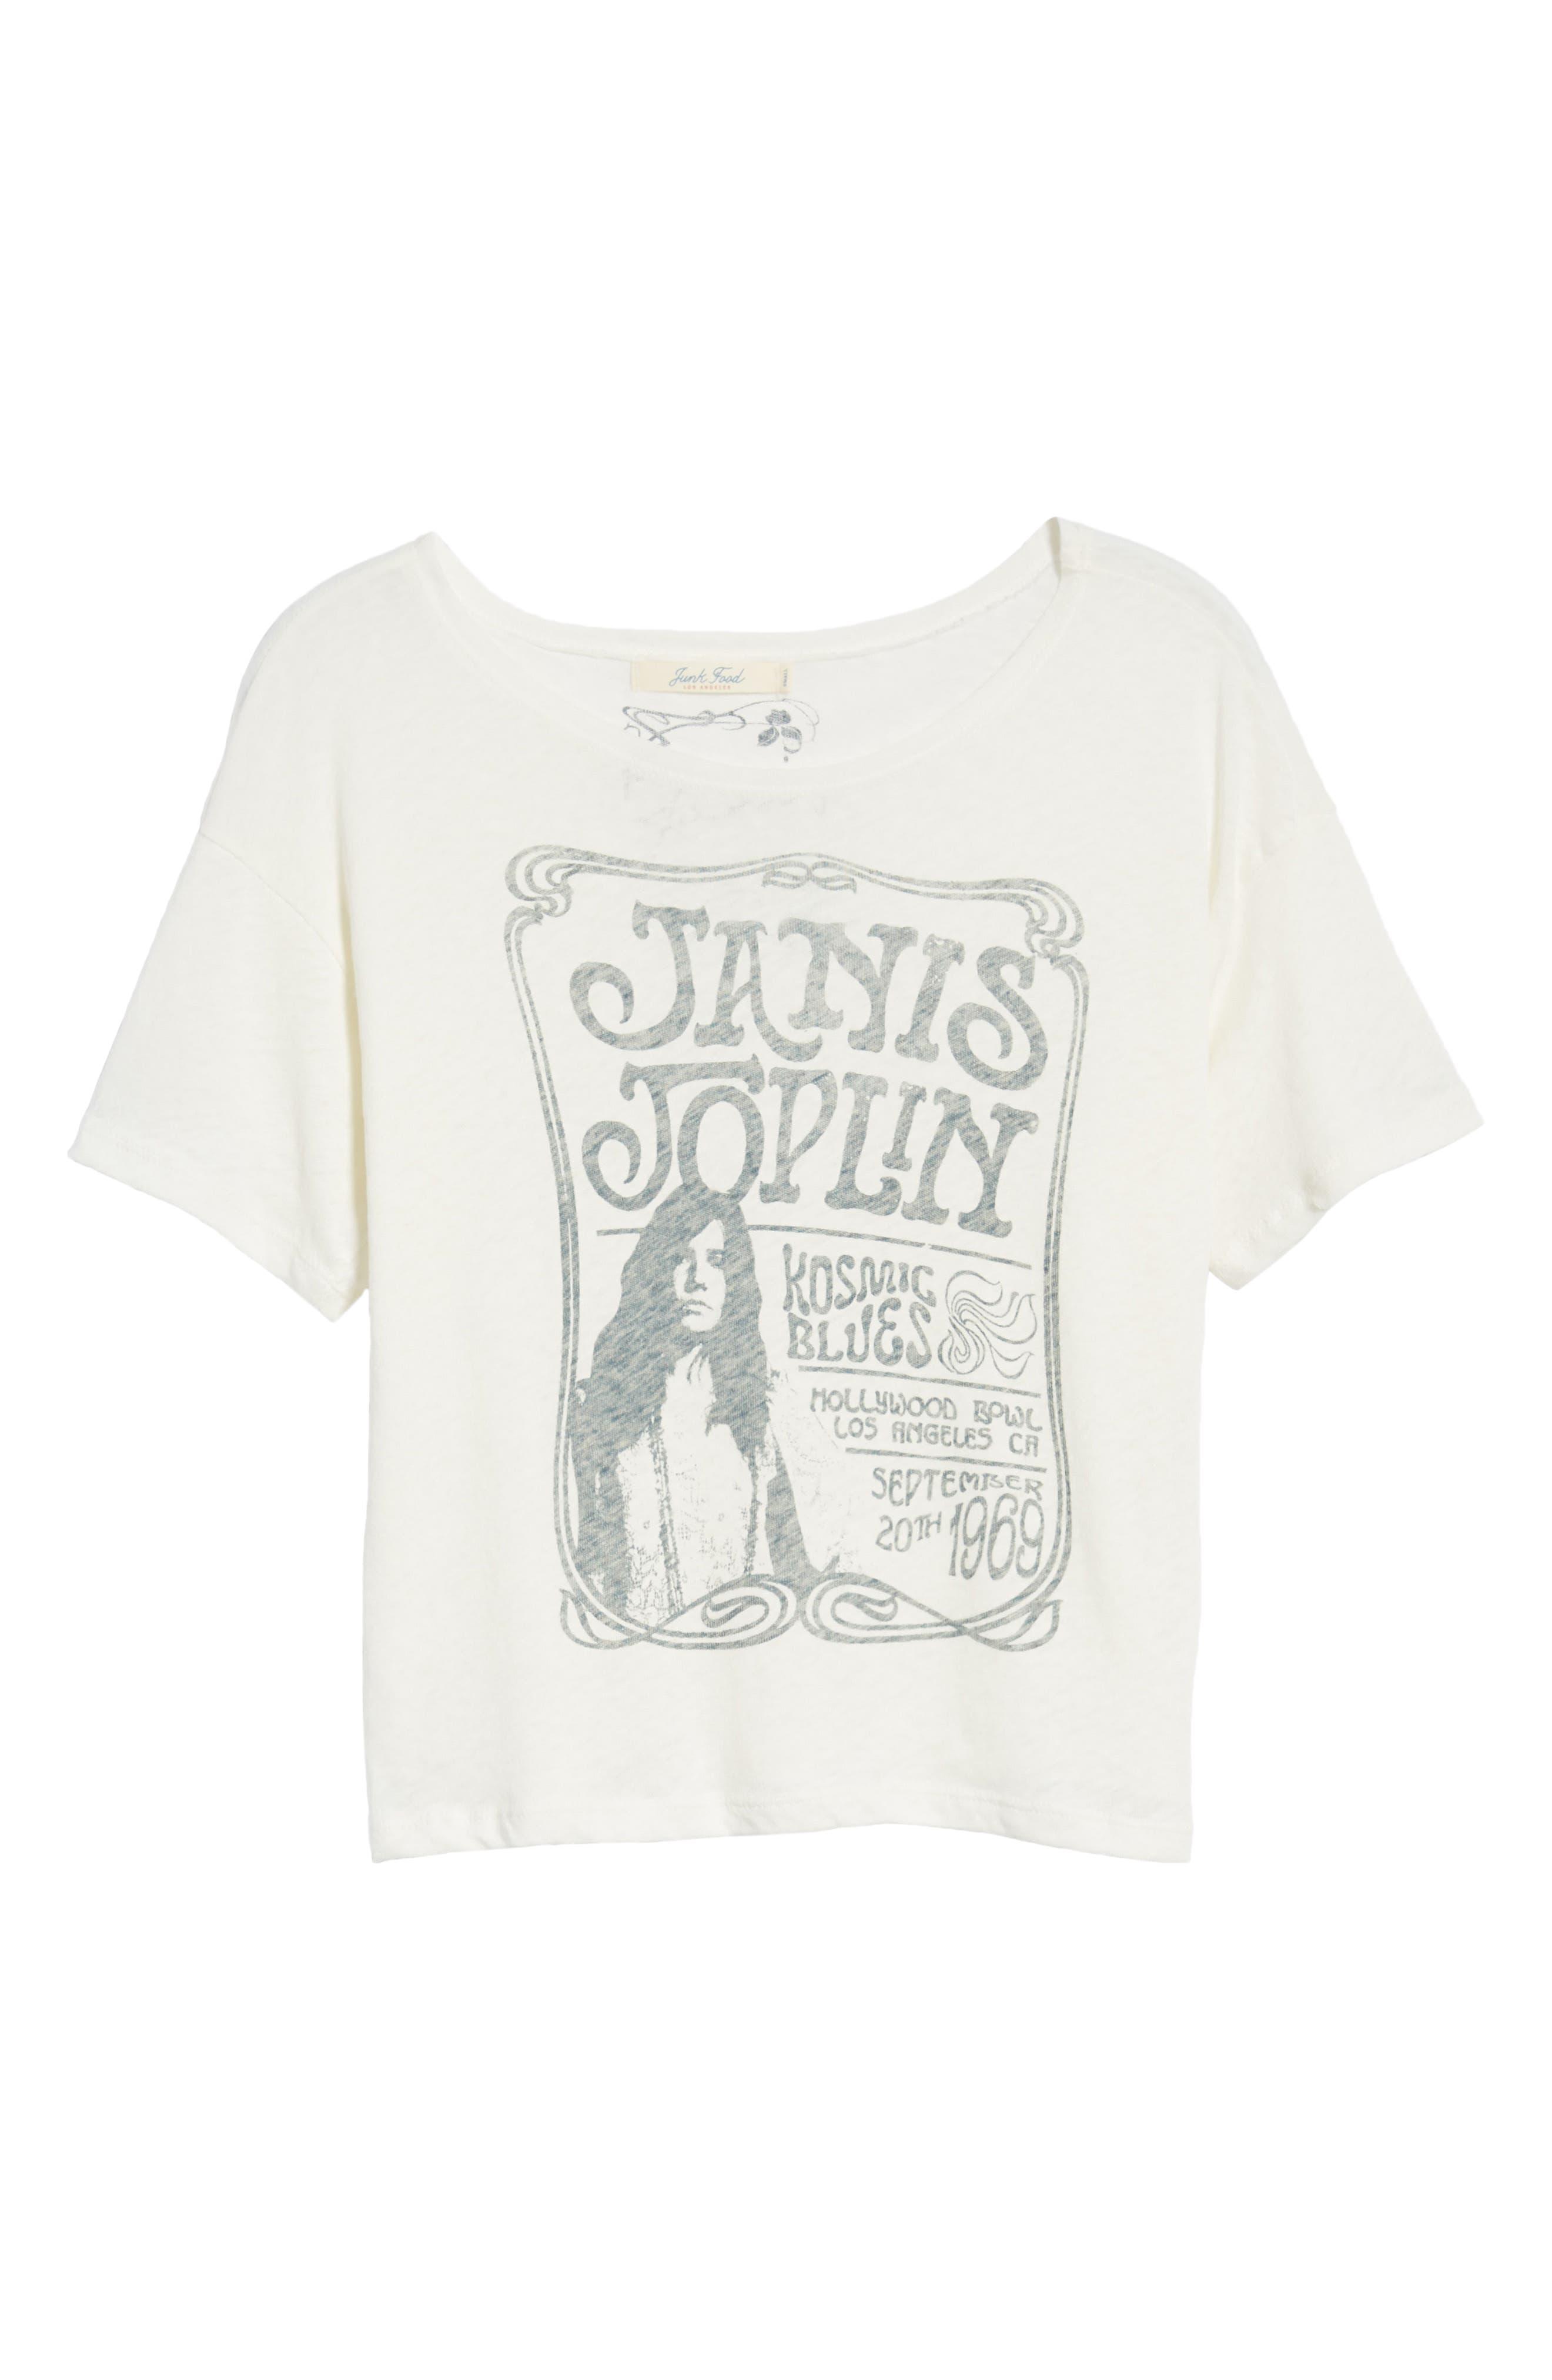 Janis Joplin Tee,                             Alternate thumbnail 7, color,                             Sugar